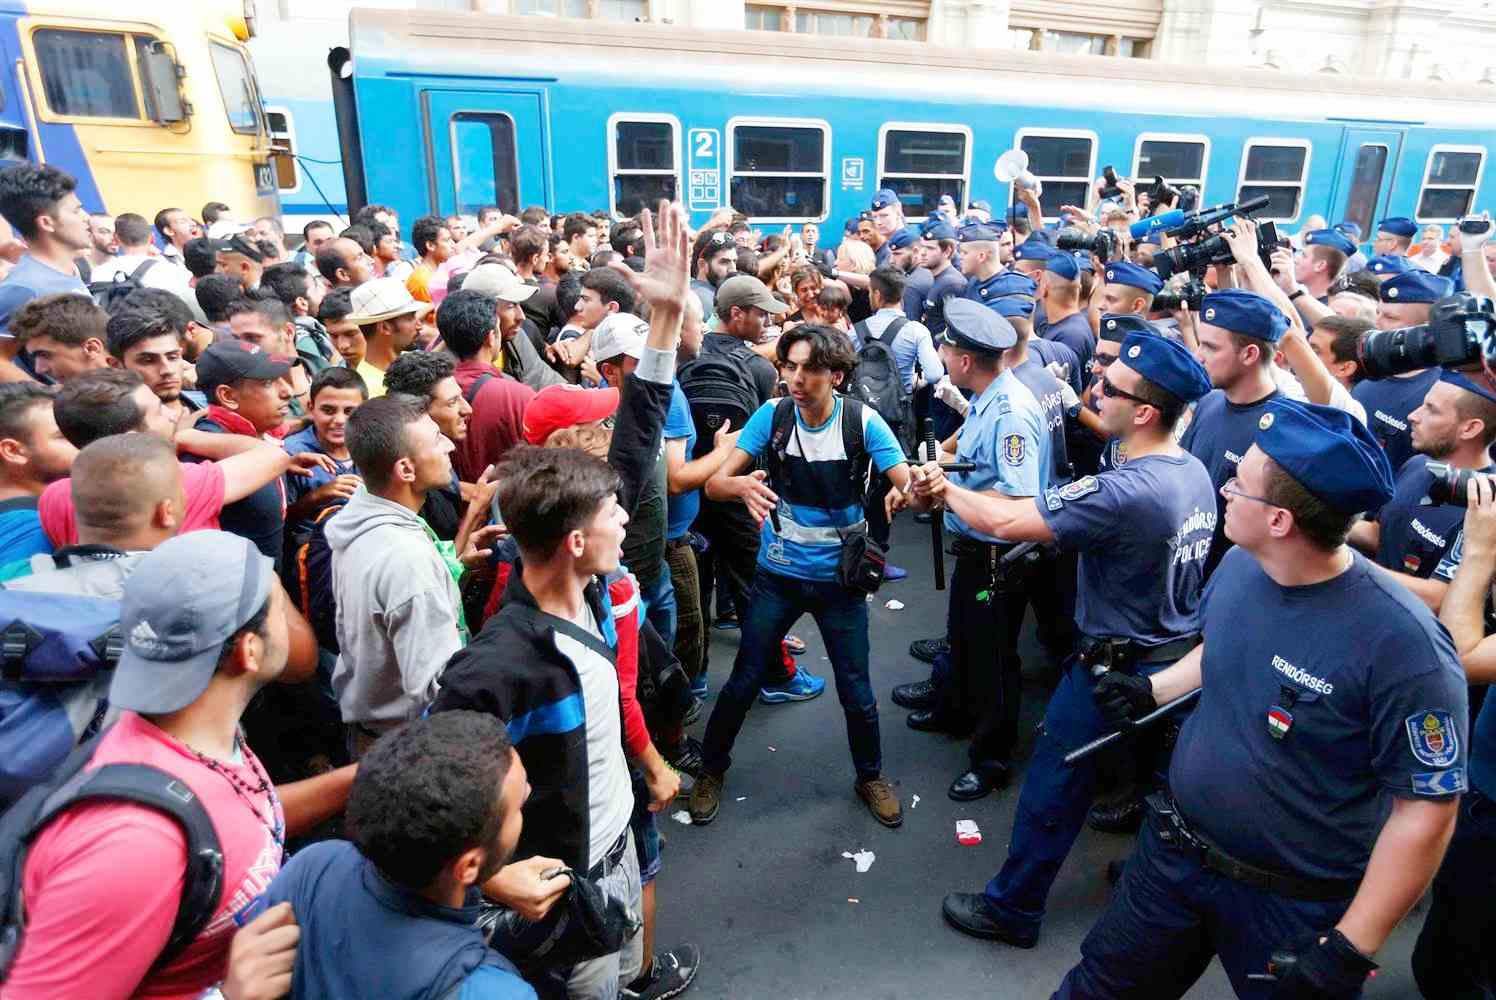 budapest150901-migrants-hungary-train-closure-jpo-4234_15c16bff08a8ea42045b70d3f3eb4117.nbcnews-ux-2880-1000